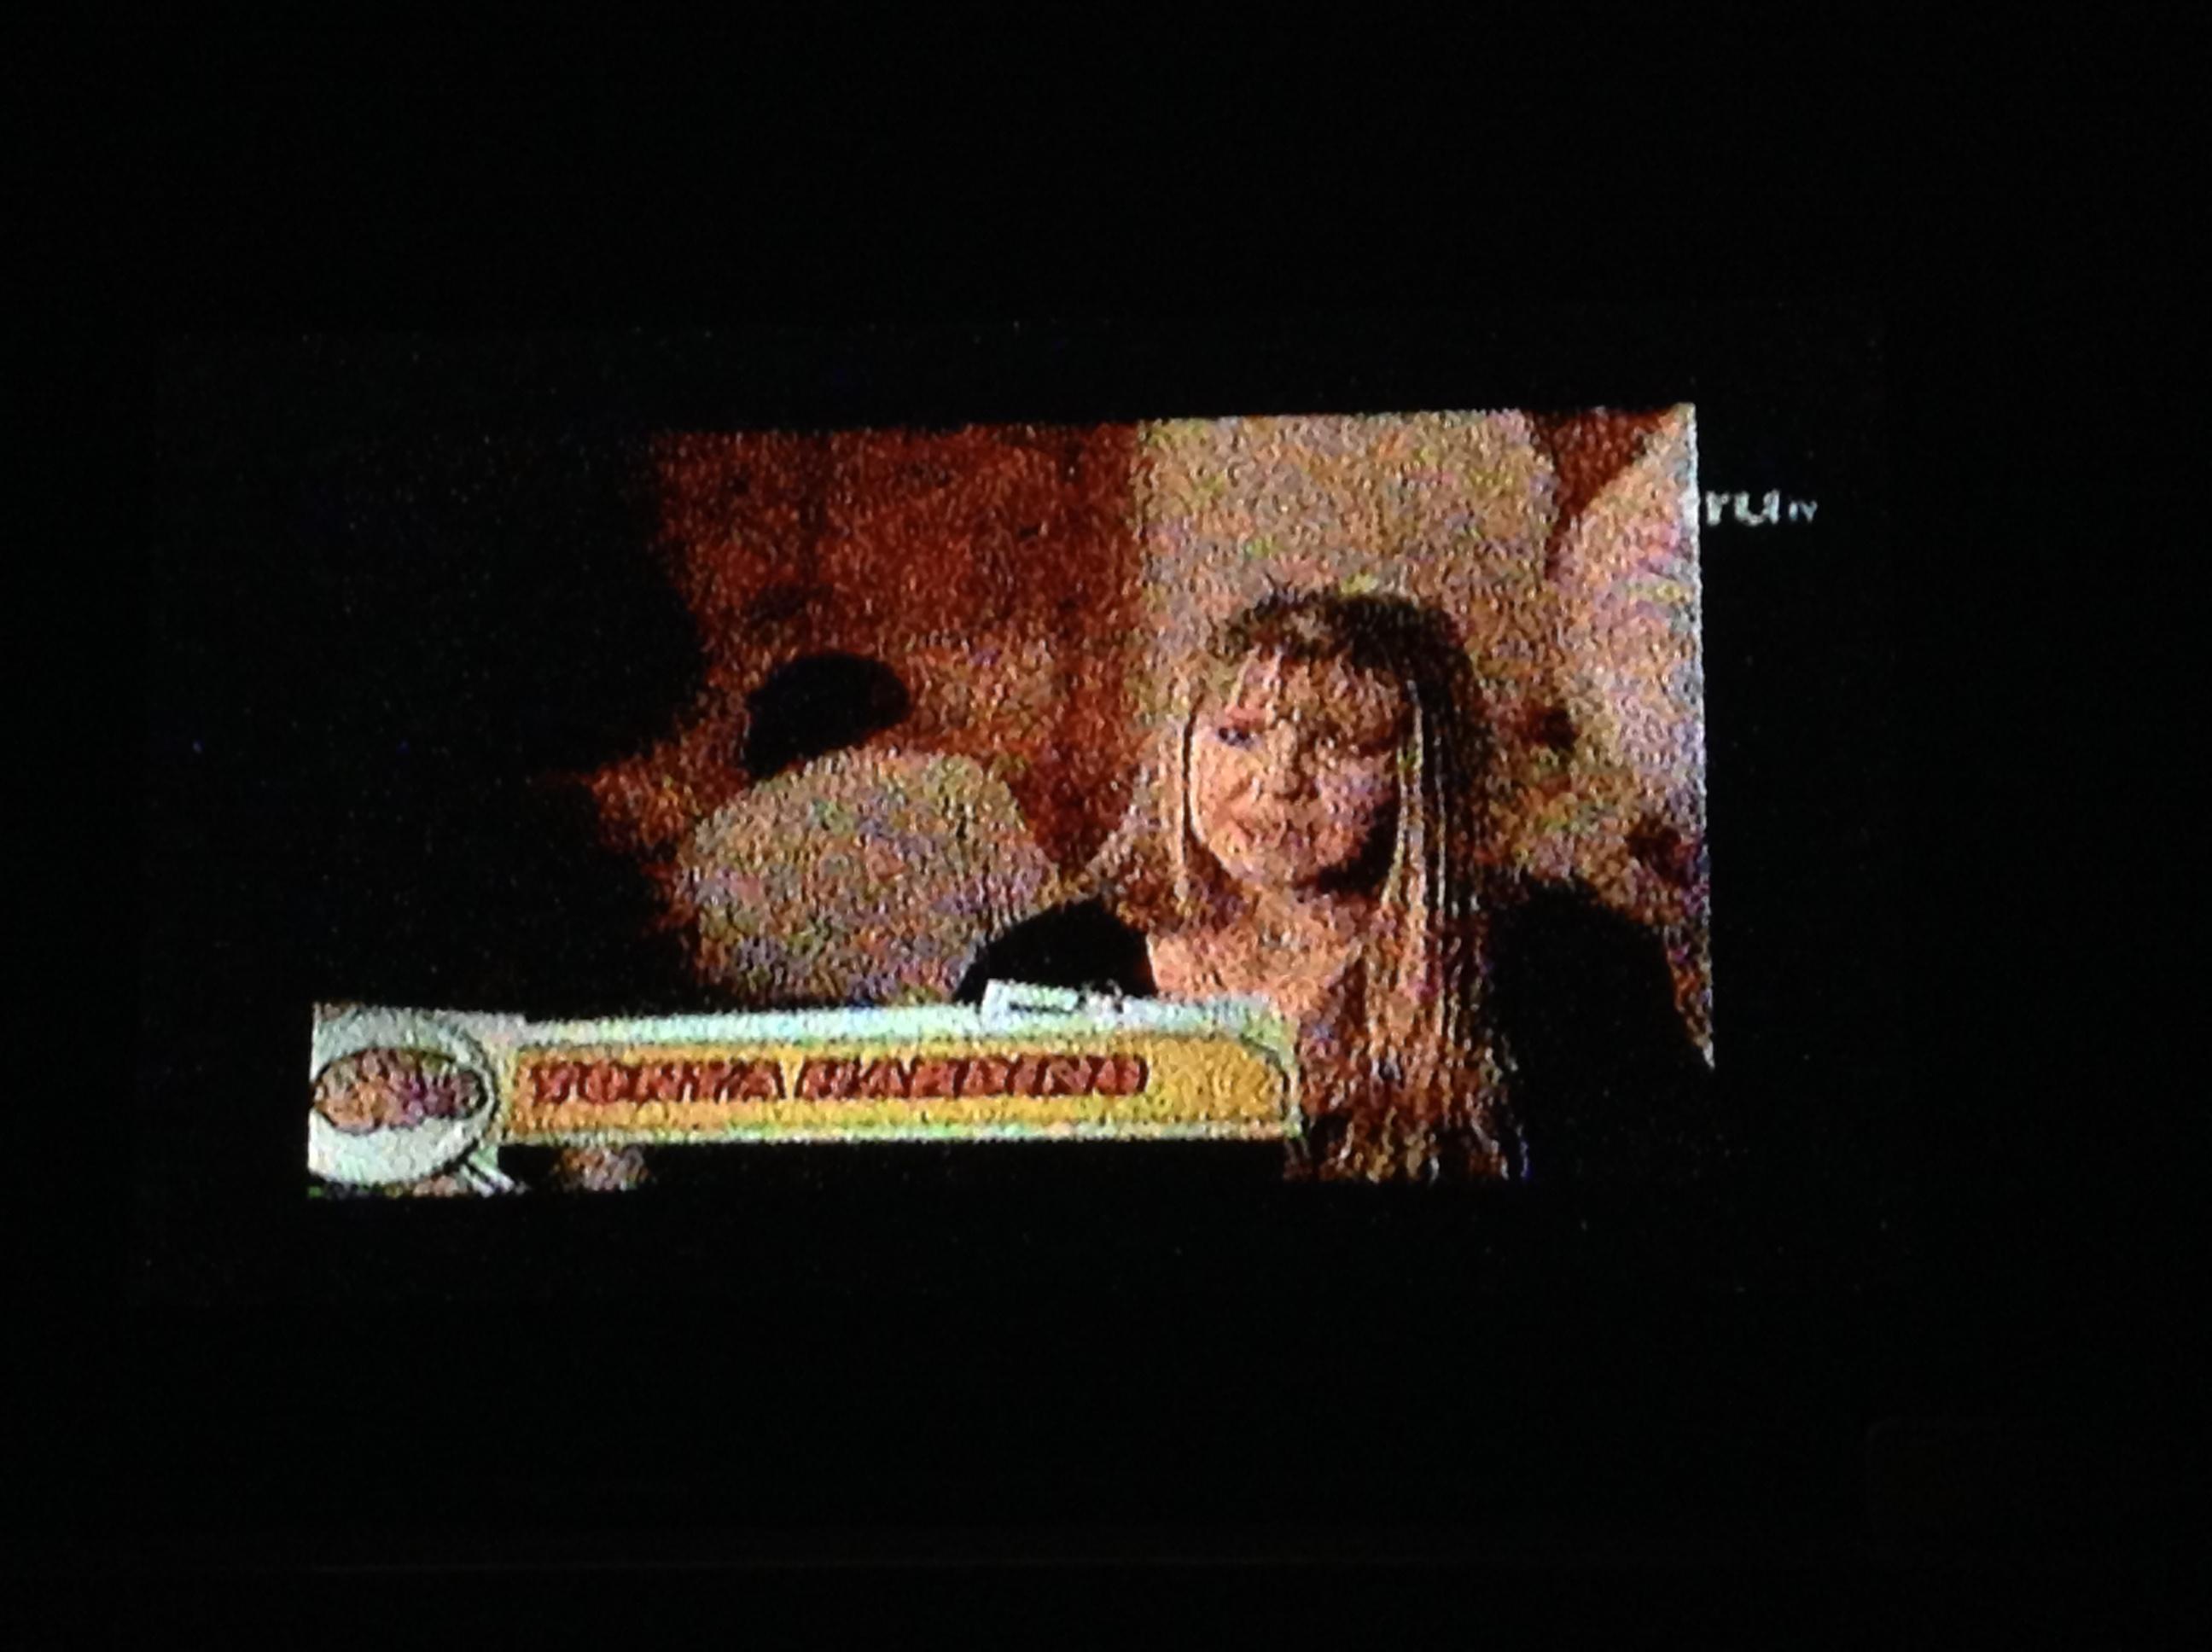 Worlds Dumbest images Tonya Harding in Criminals 21 2 HD 2592x1936